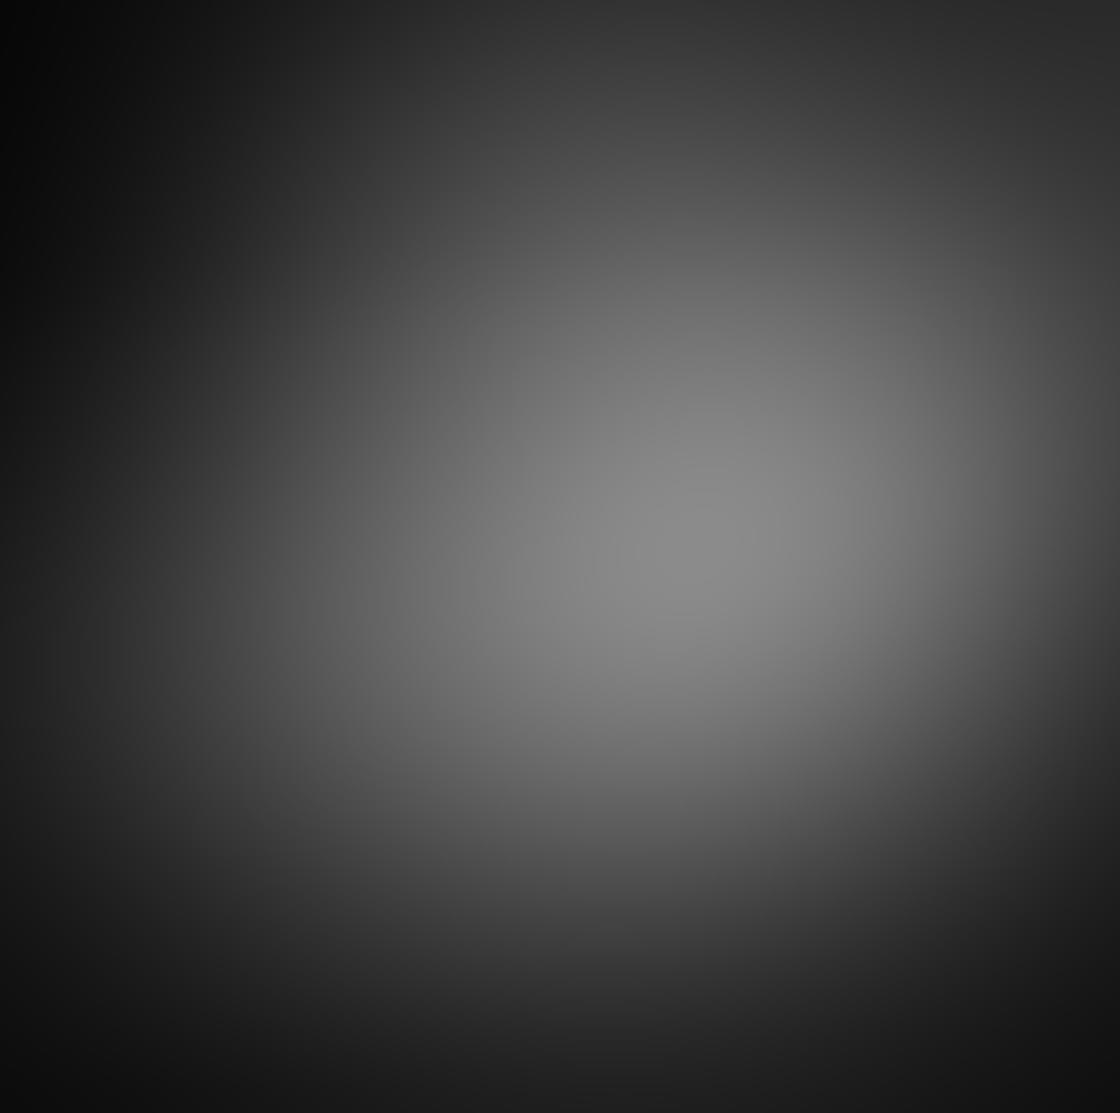 iPhone Photos Black White 4